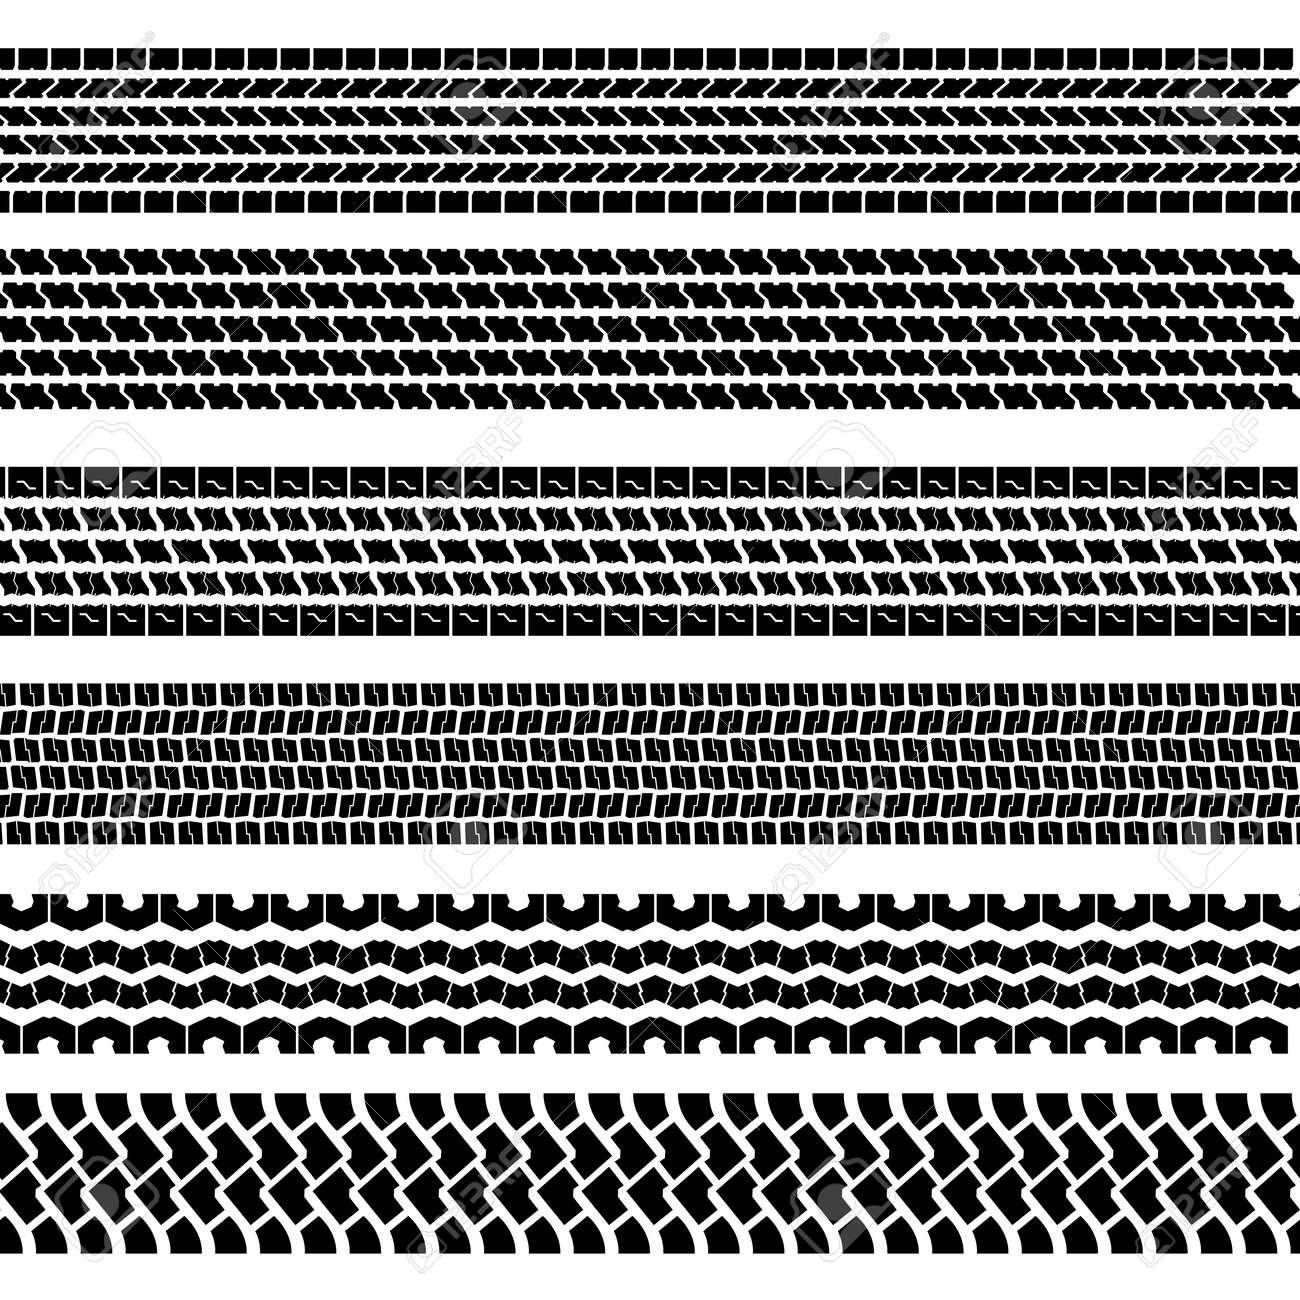 Set of detailed tire prints, vector illustration - 24294506